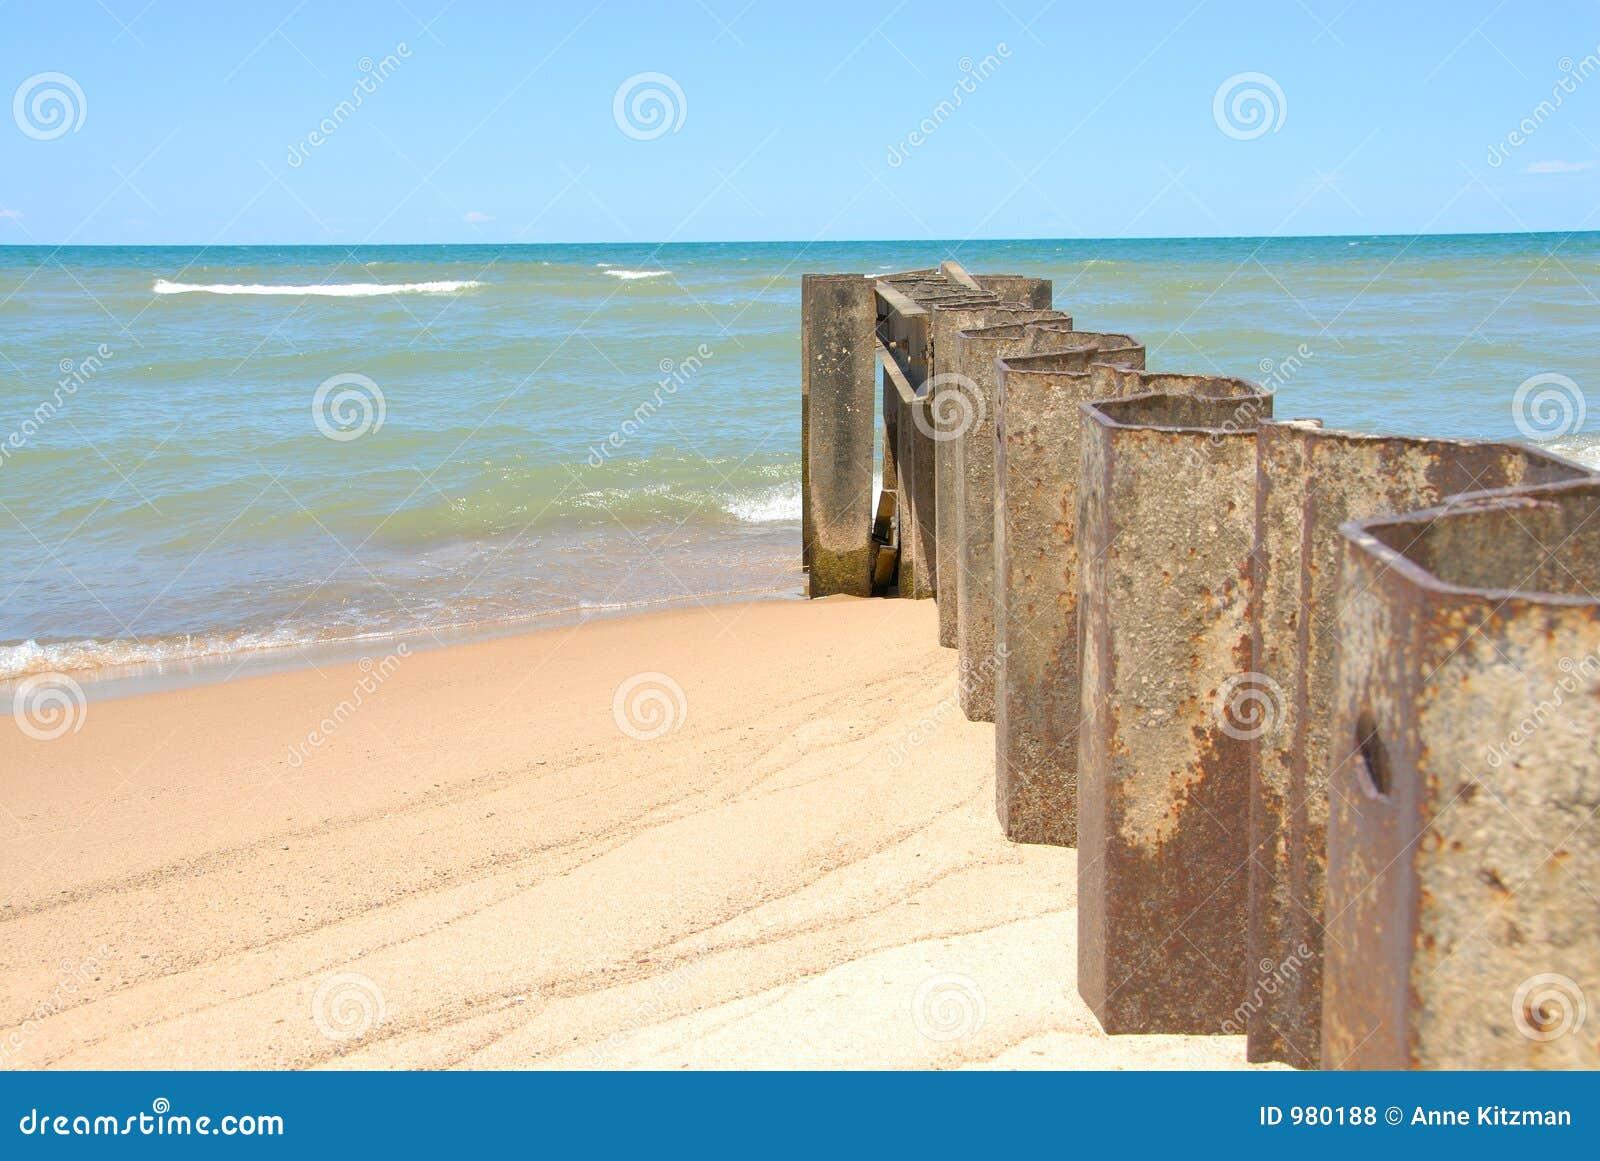 Säkerhetsbrytarelakemichigan shoreline